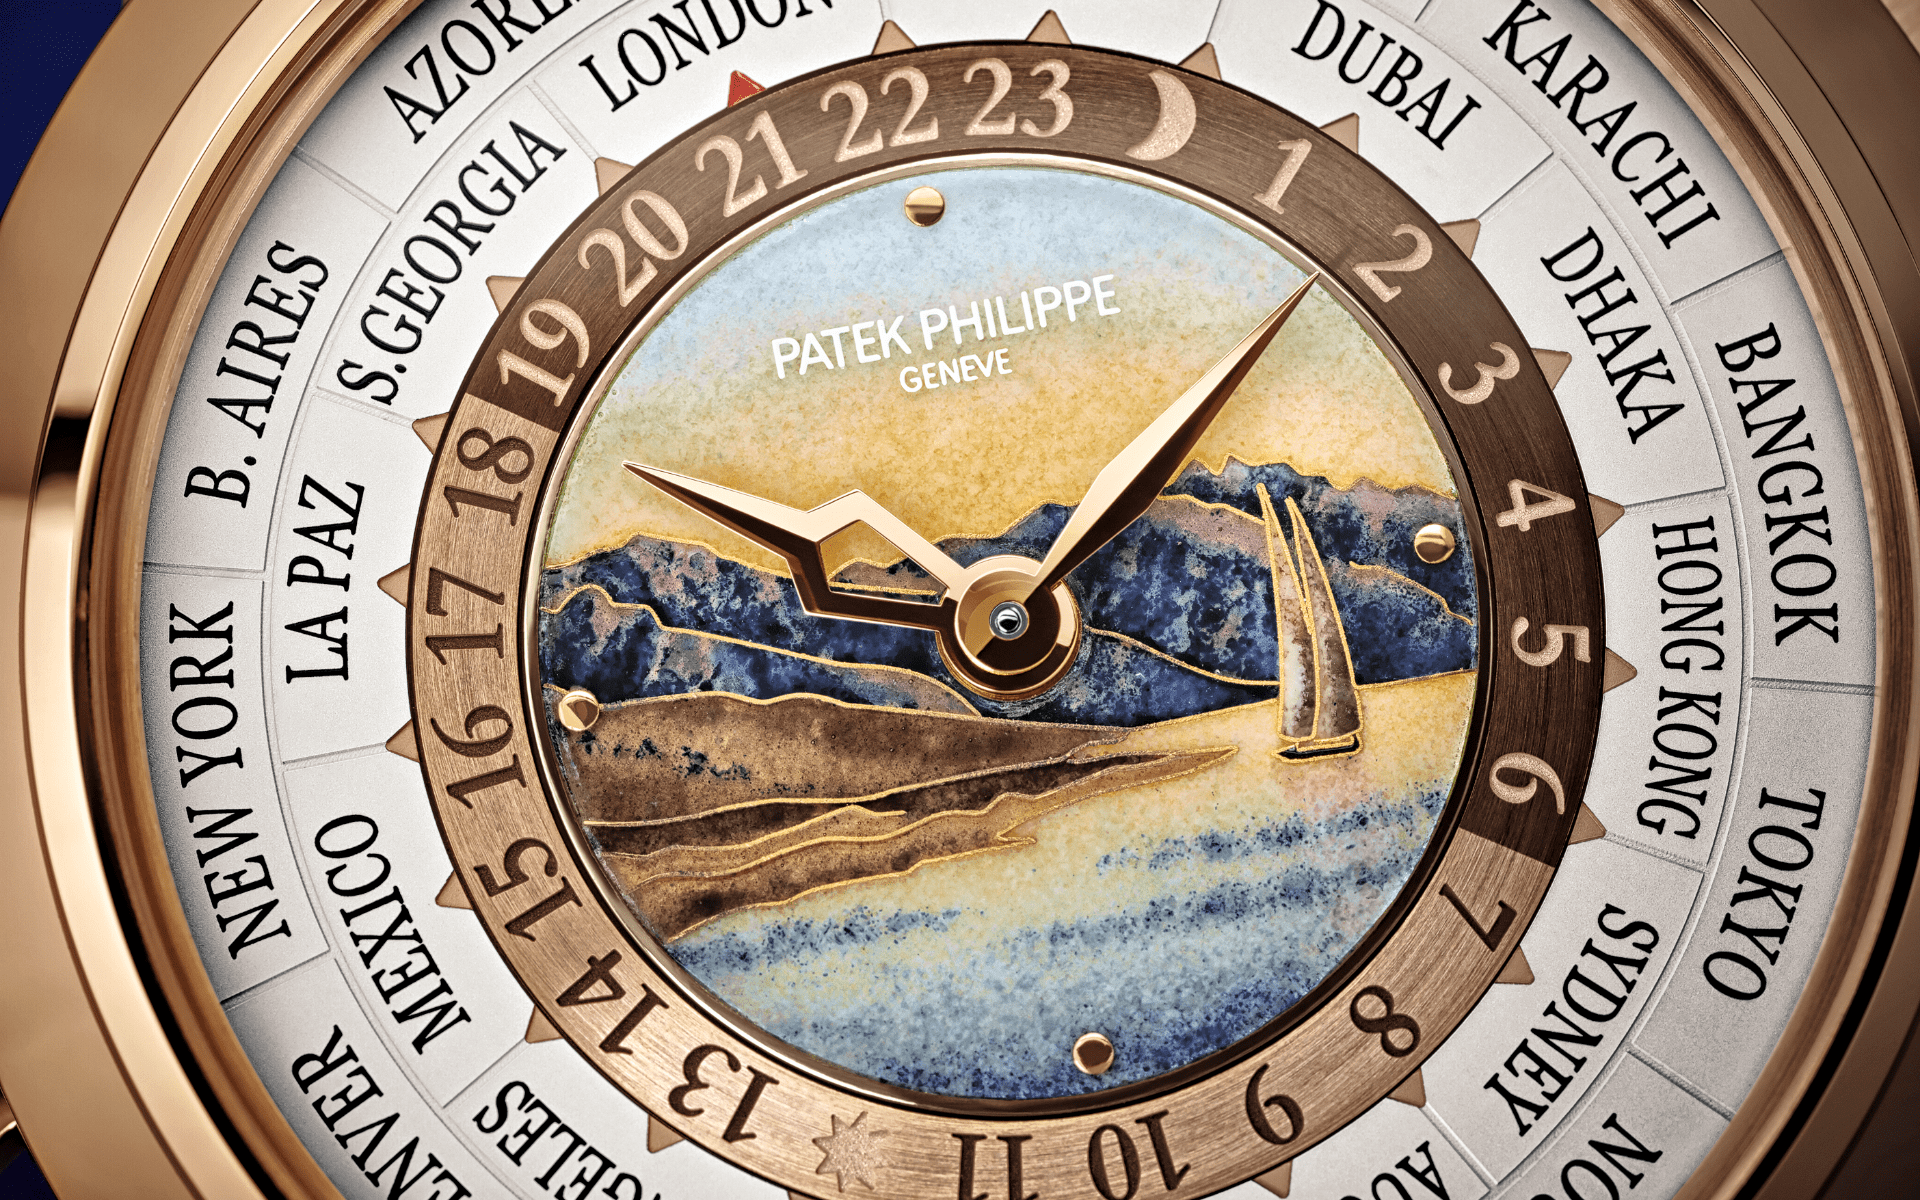 Patek Philippe Ref. 5531R World Time Minute Repeater with cloissone enamel of Lavaux wine region (Photo: Patek Philippe)